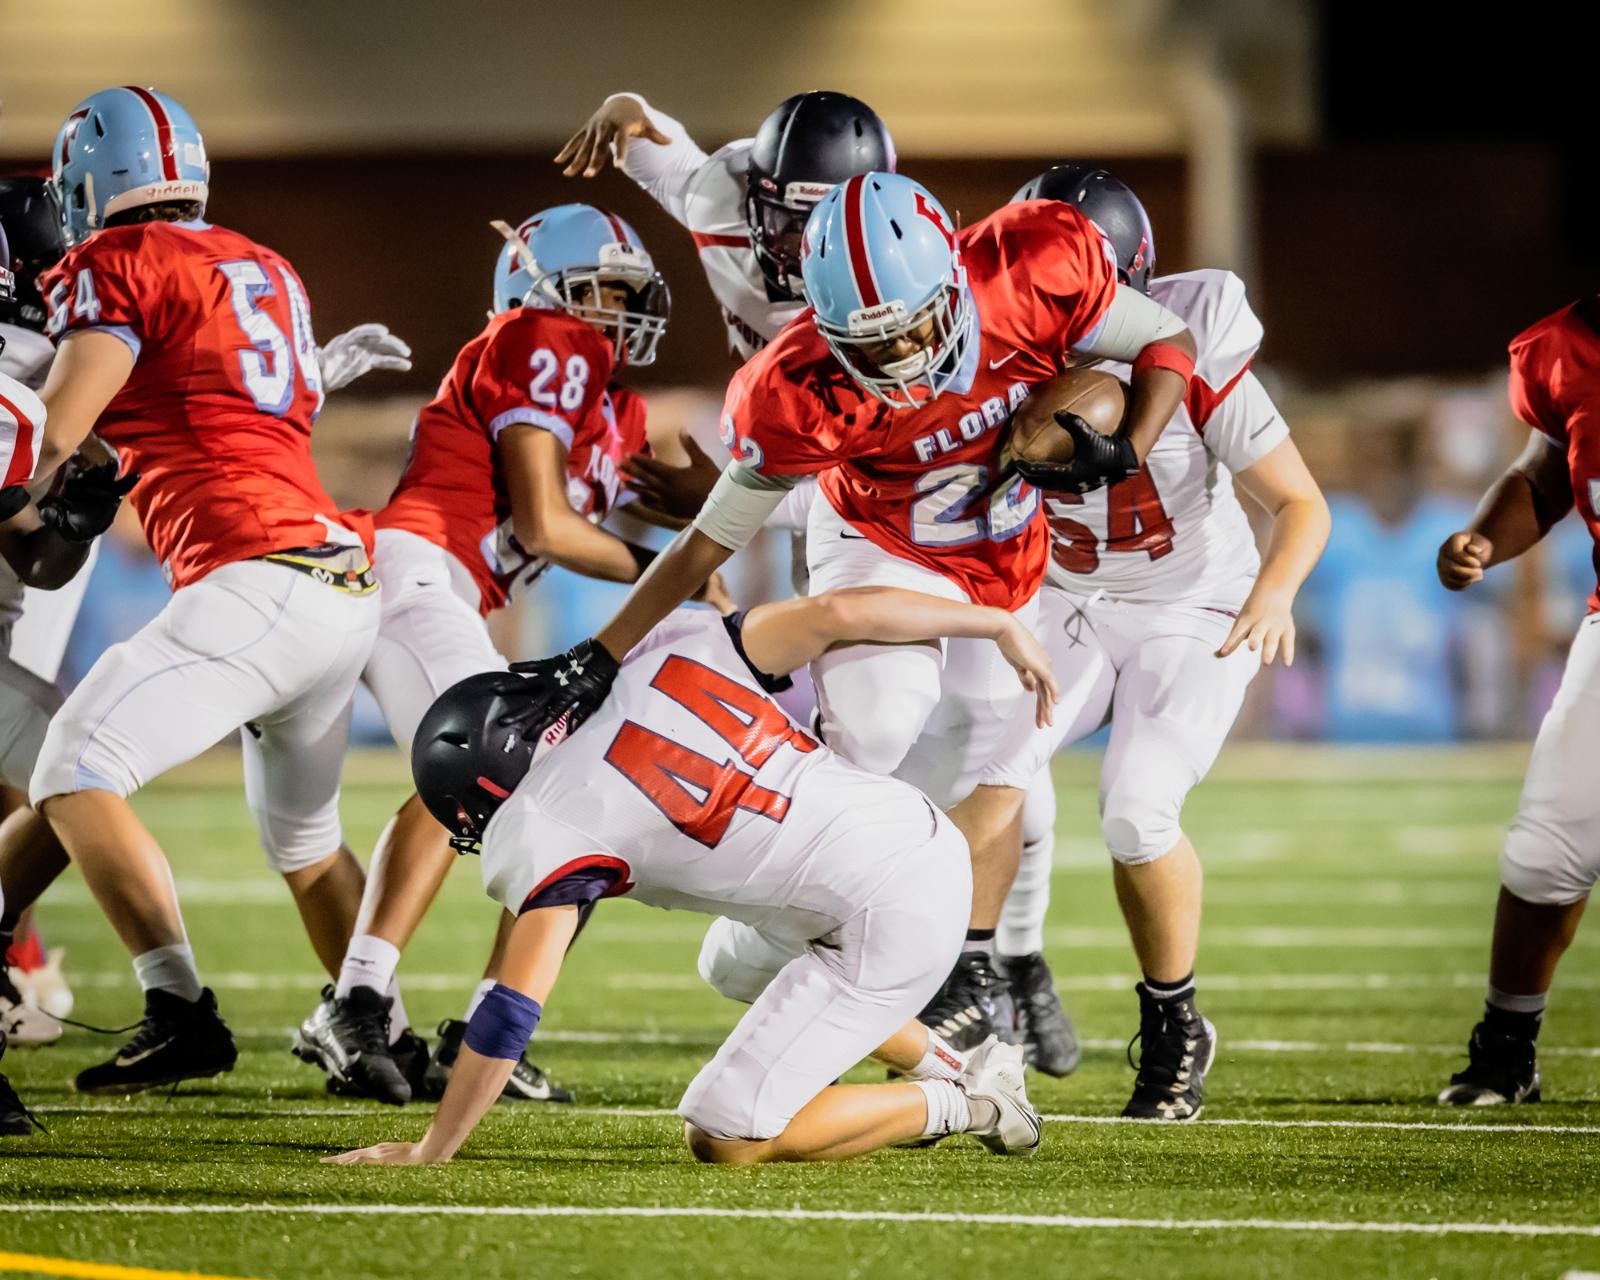 Photos: JV Football vs Lugoff-Elgin – 11/5/20